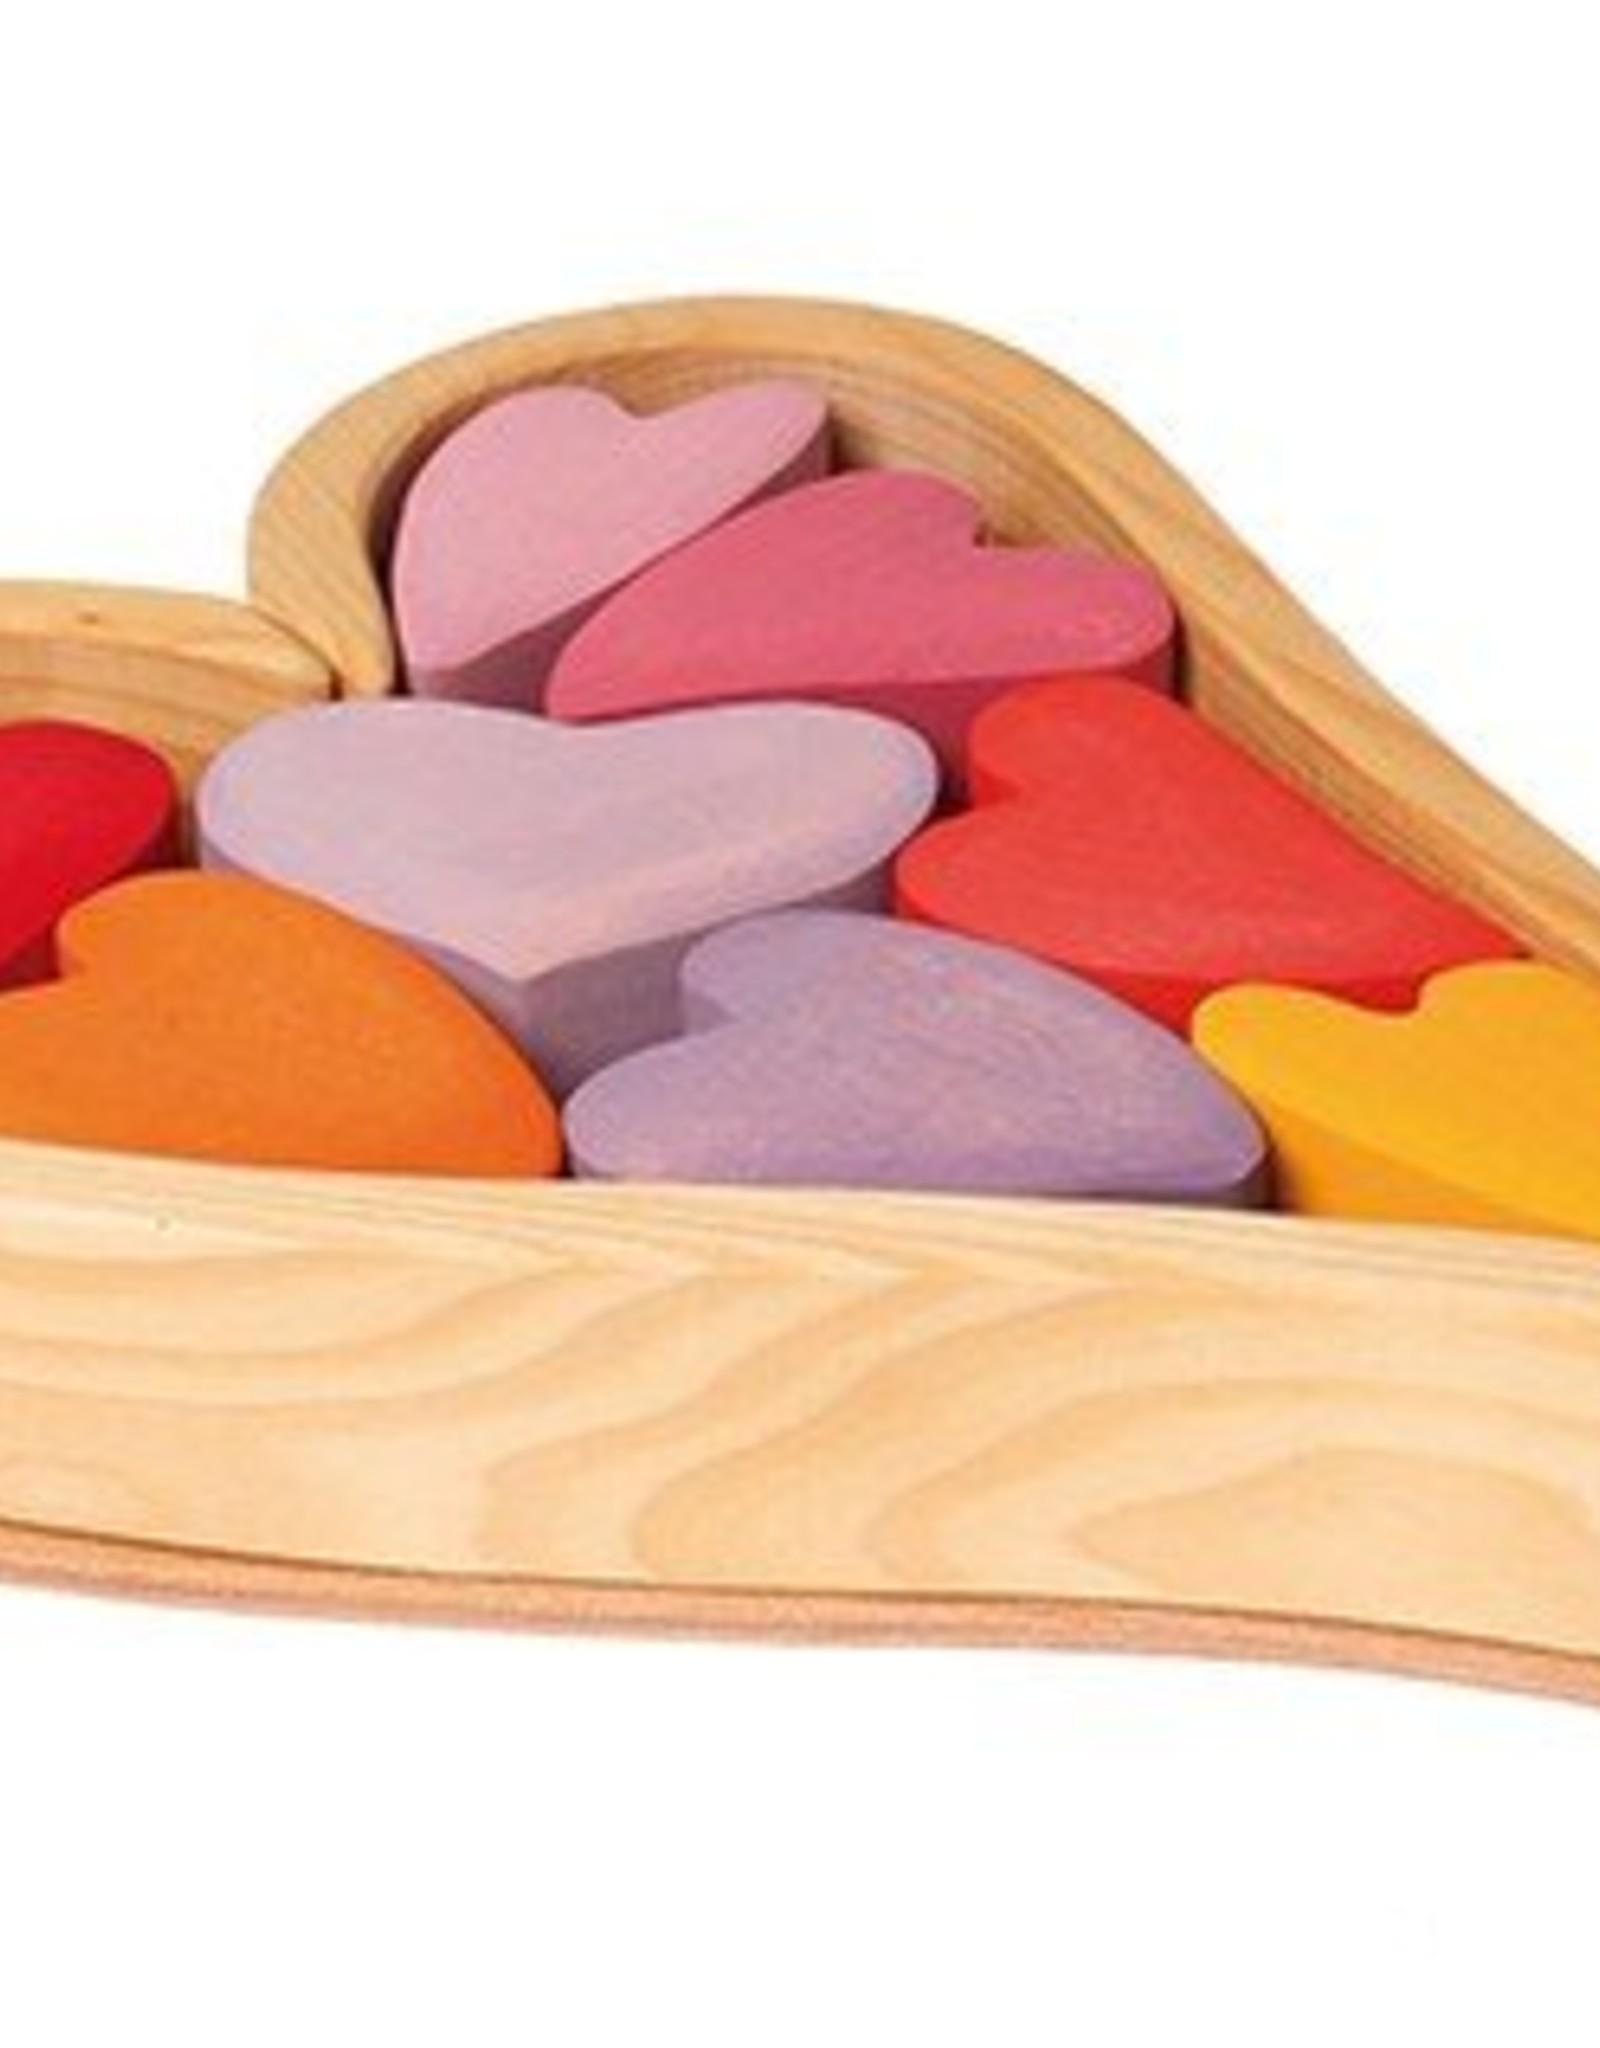 Grimm's Grimm's - Building Set Heart - Red